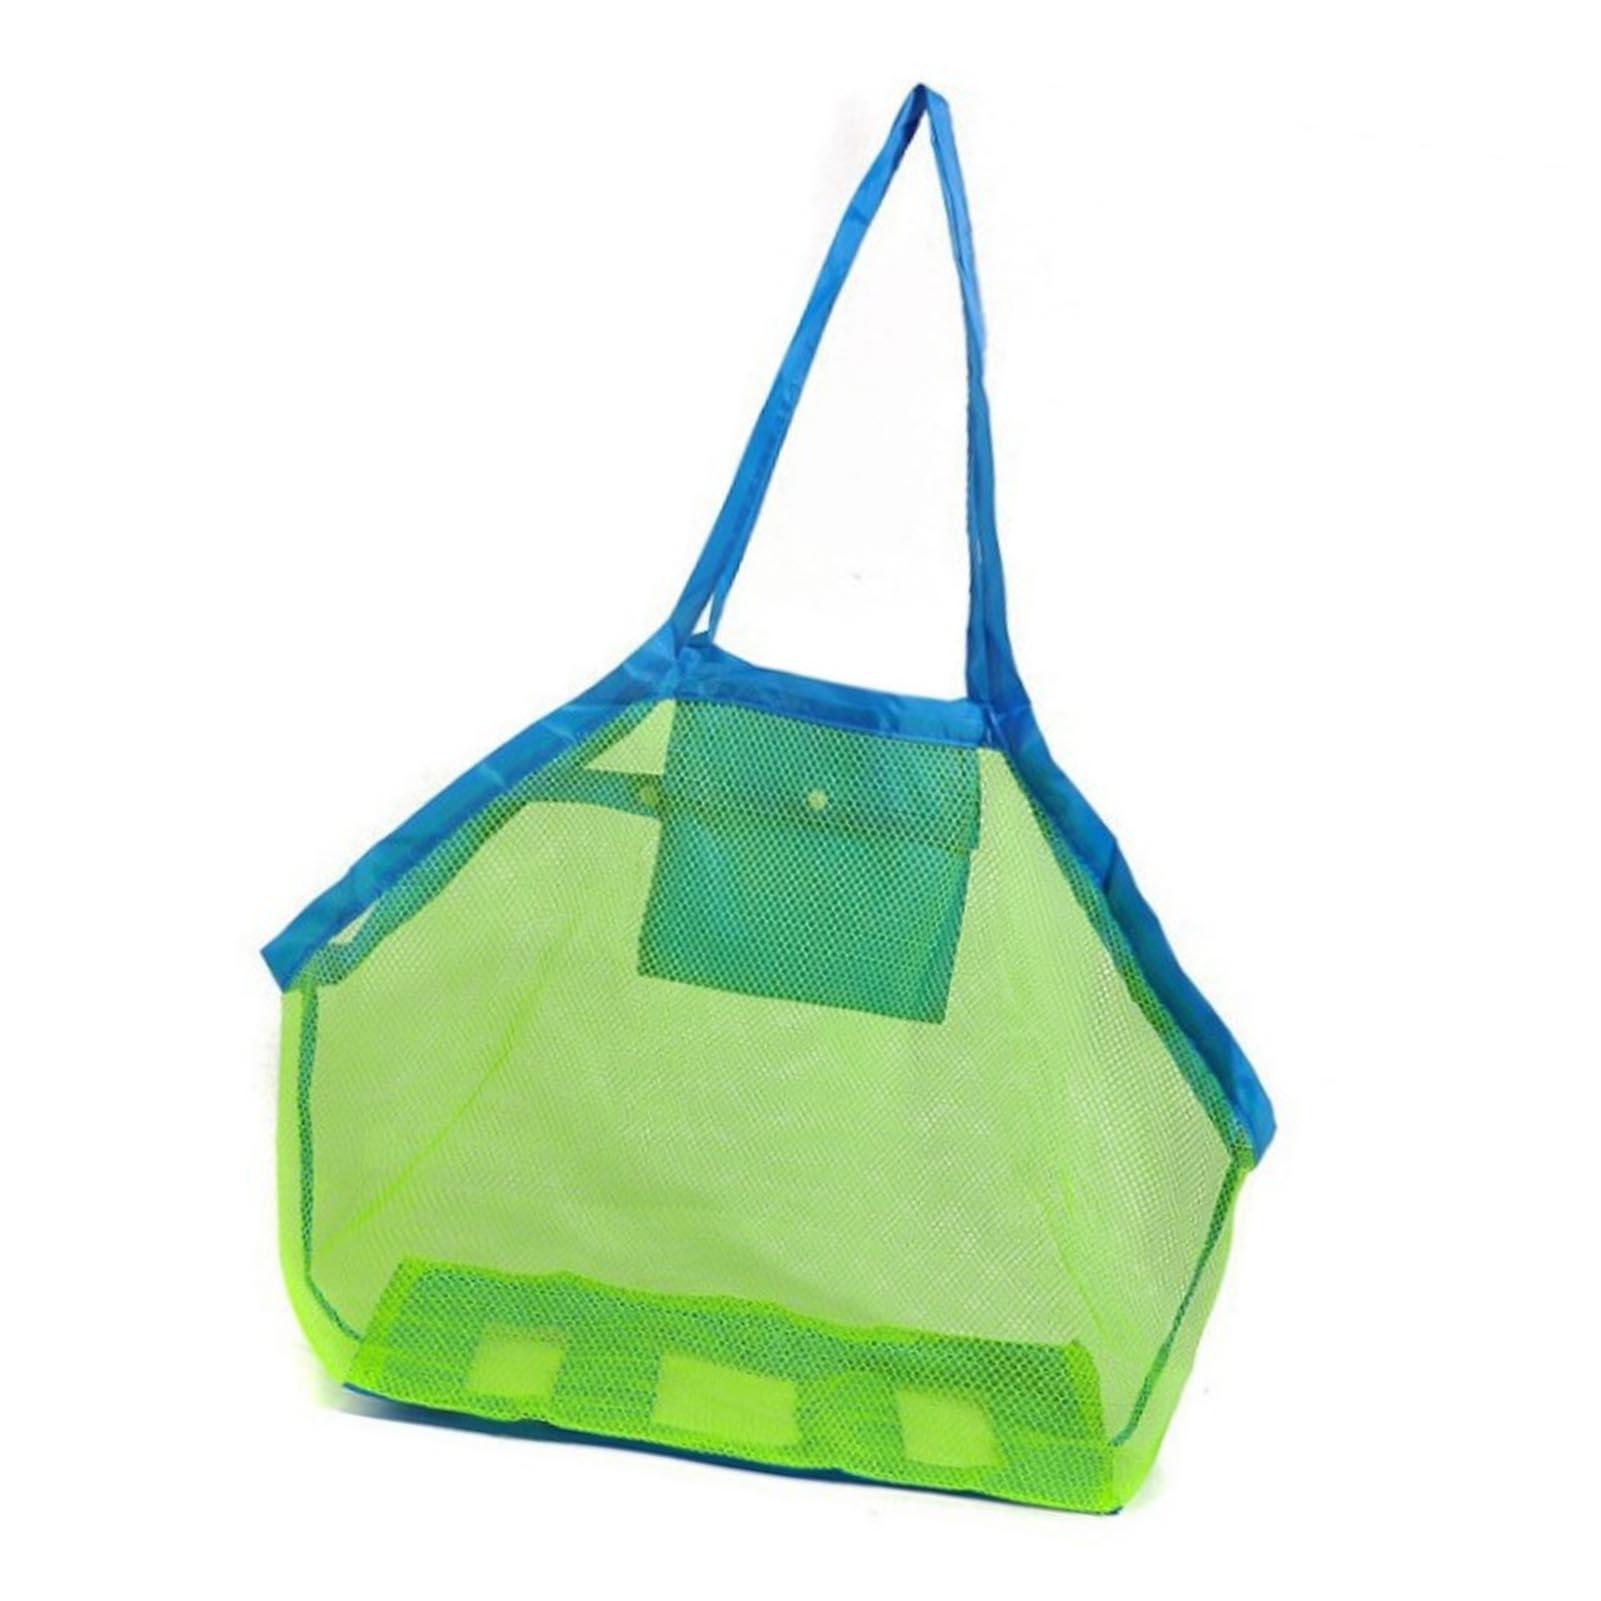 Kids Beach Toys Clothes Bags Toy Beach Mesh Bag Children Sand Away Protable Storage Sundries Organizers Bag Cosmetic Makeup Bag